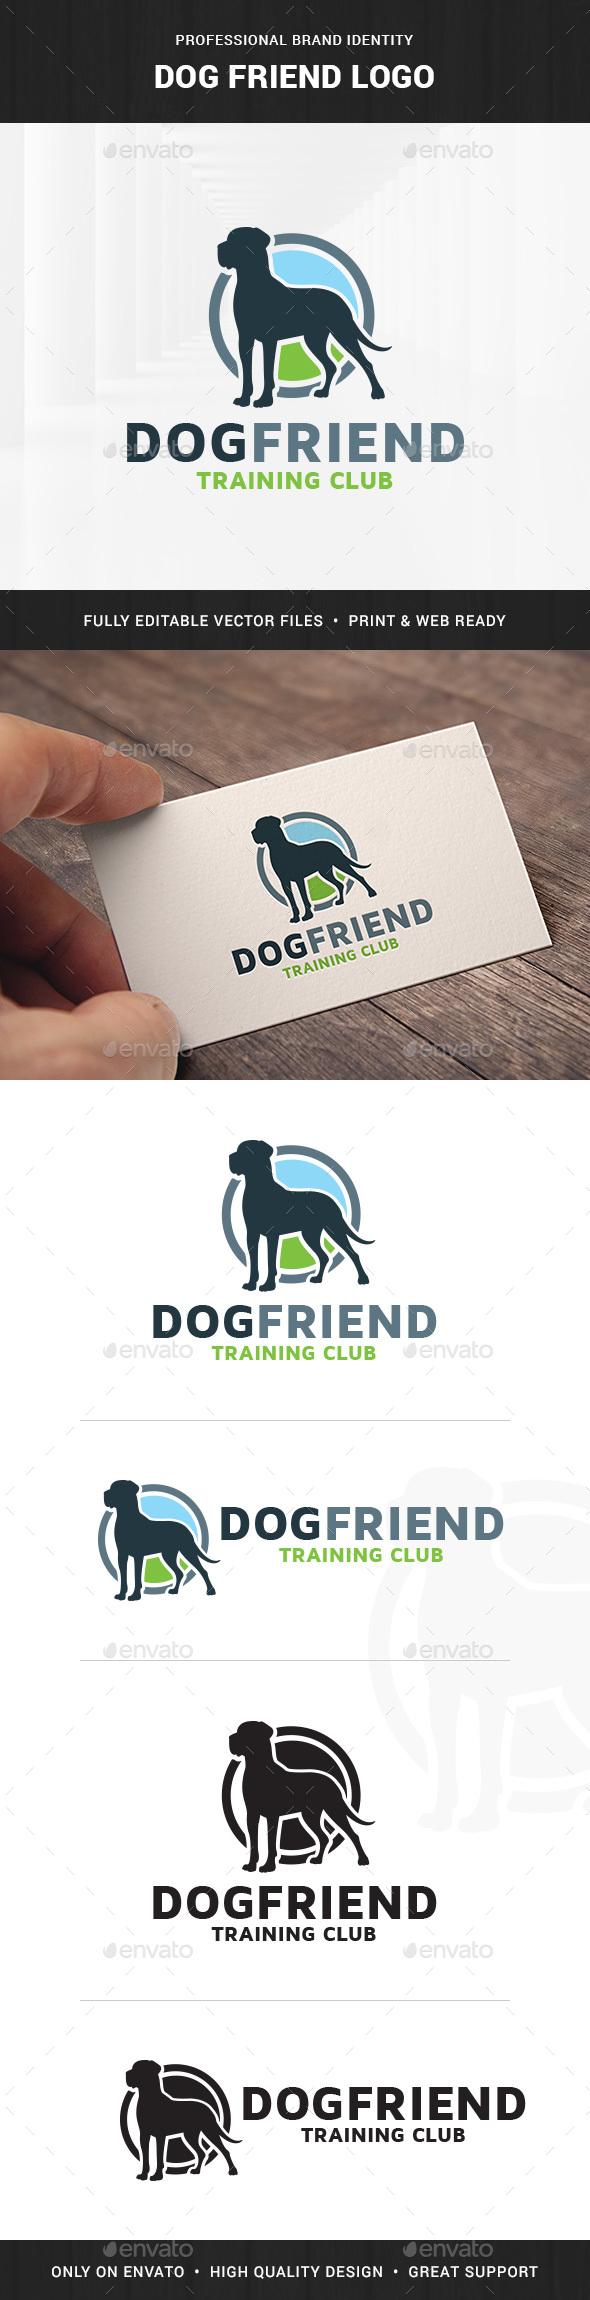 Dog Friend Logo Template - Animals Logo Templates